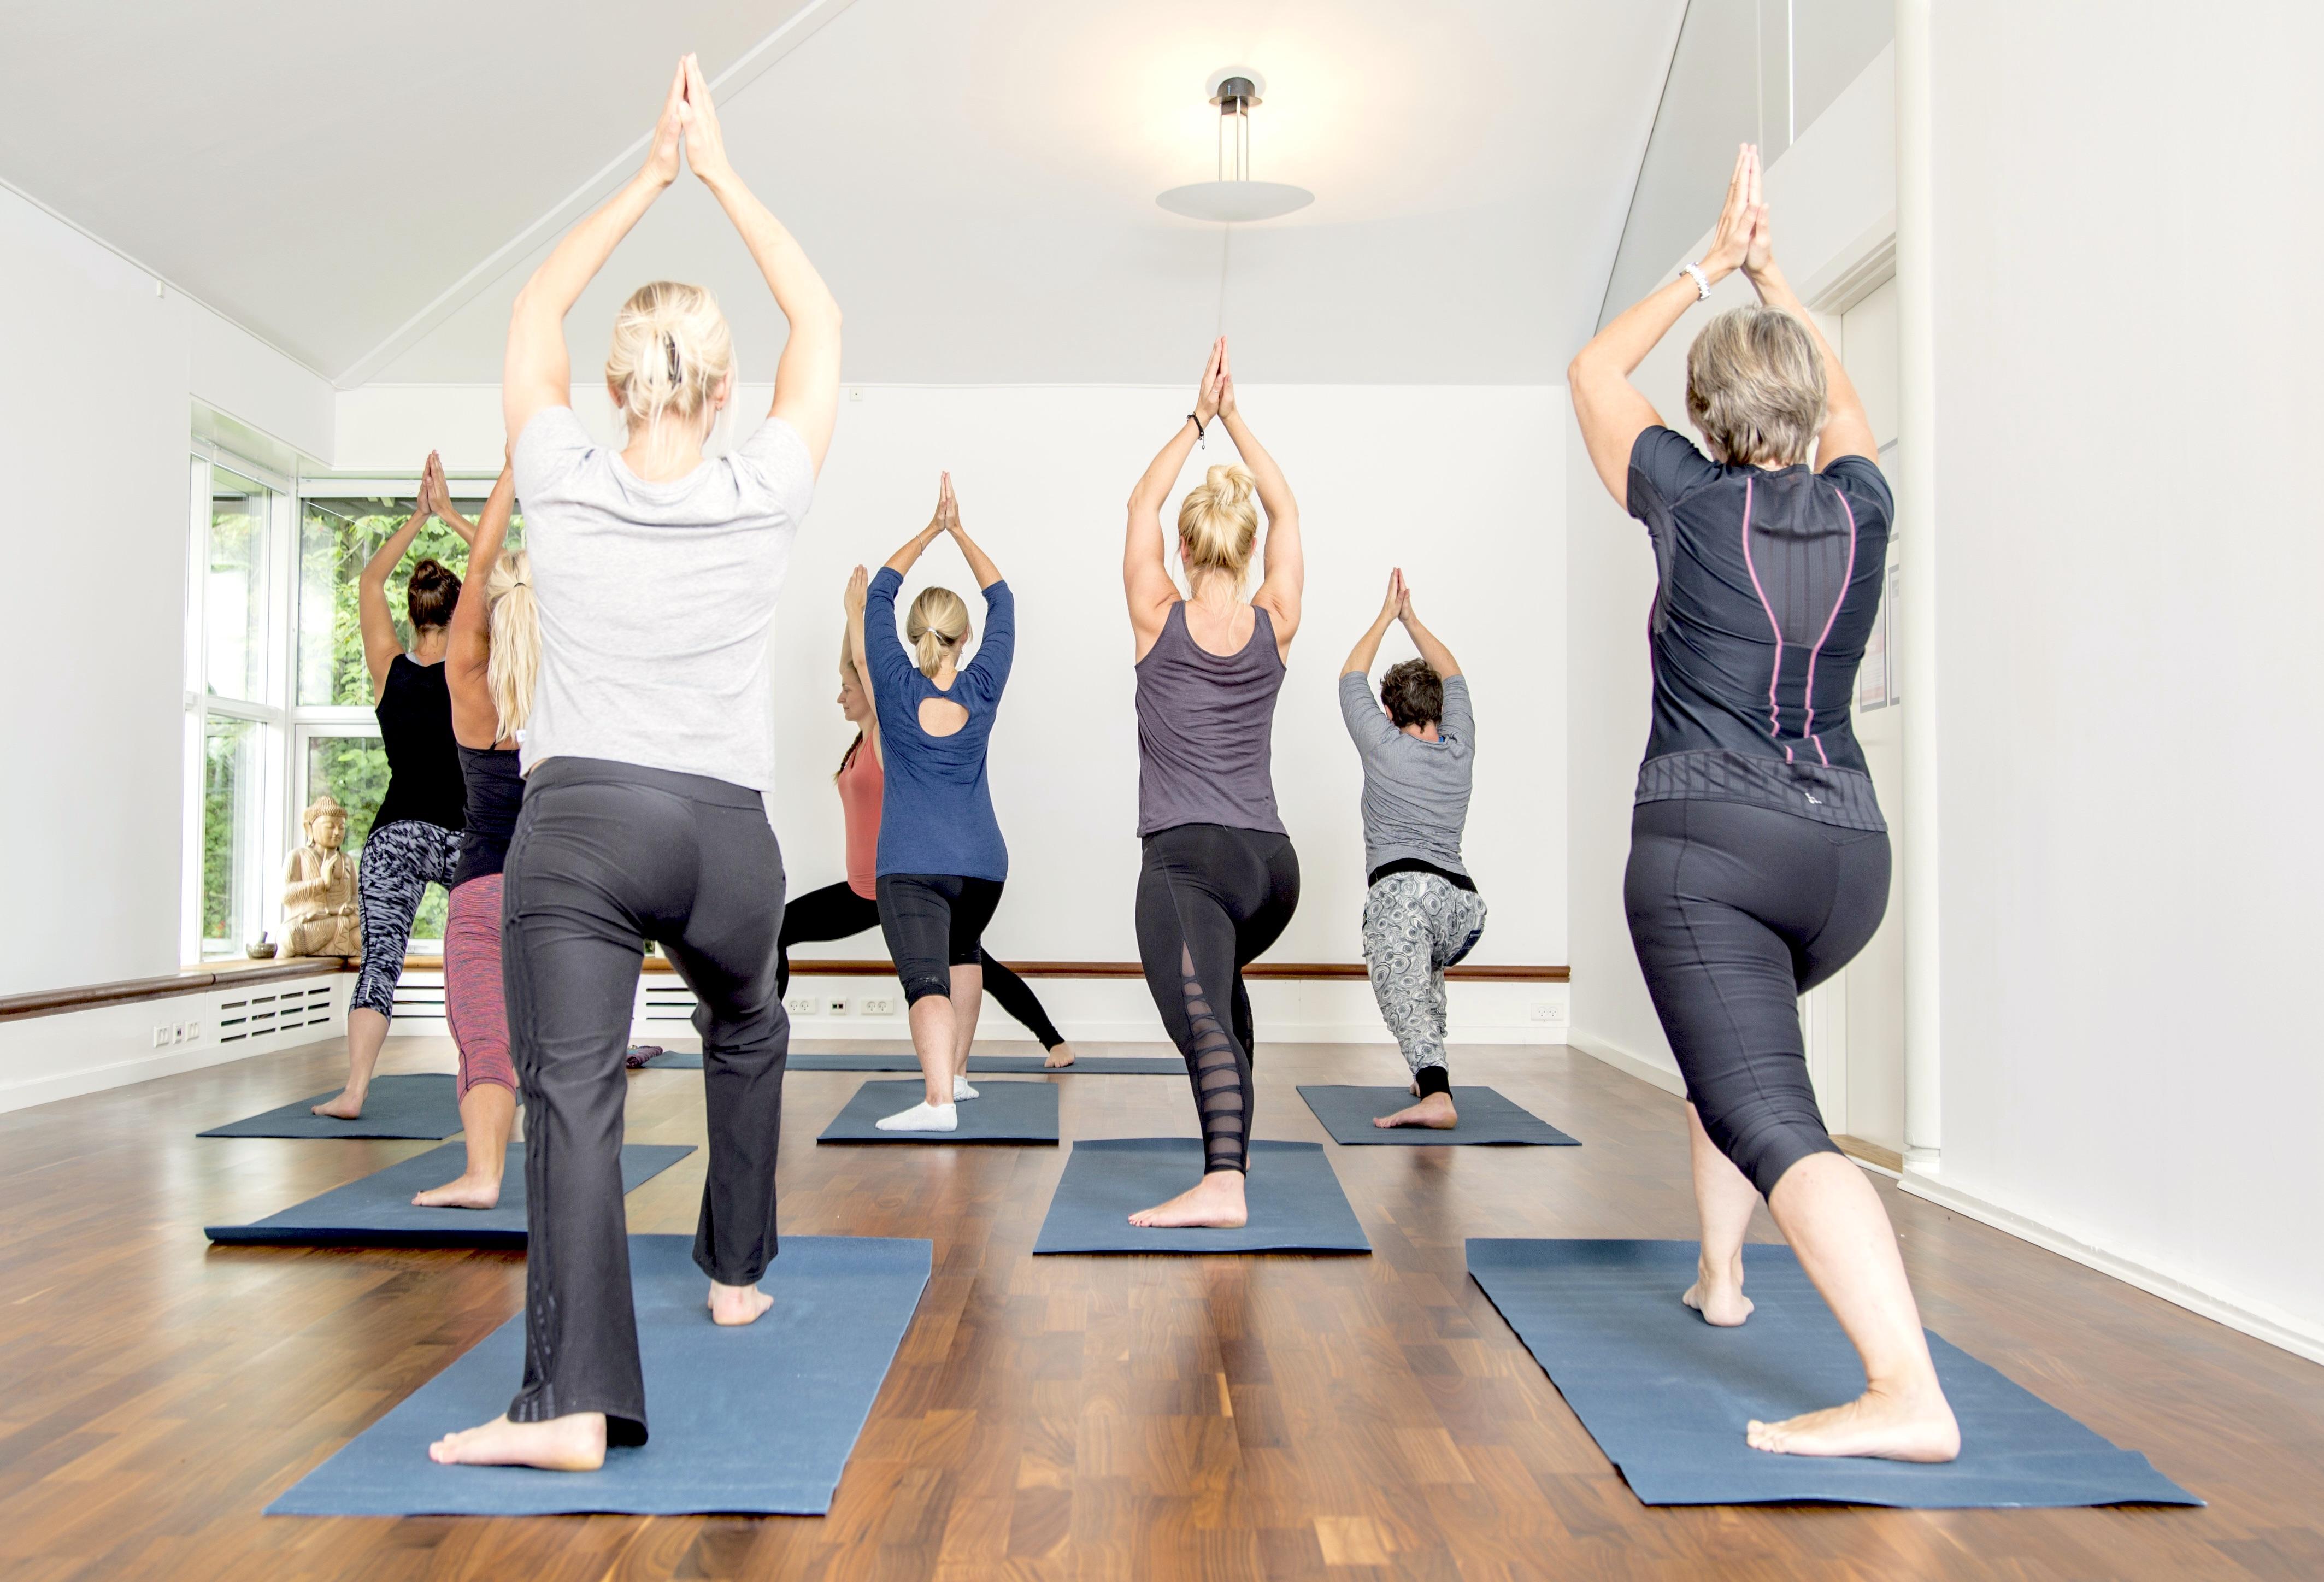 living lotus yoga studio kongens lyngby